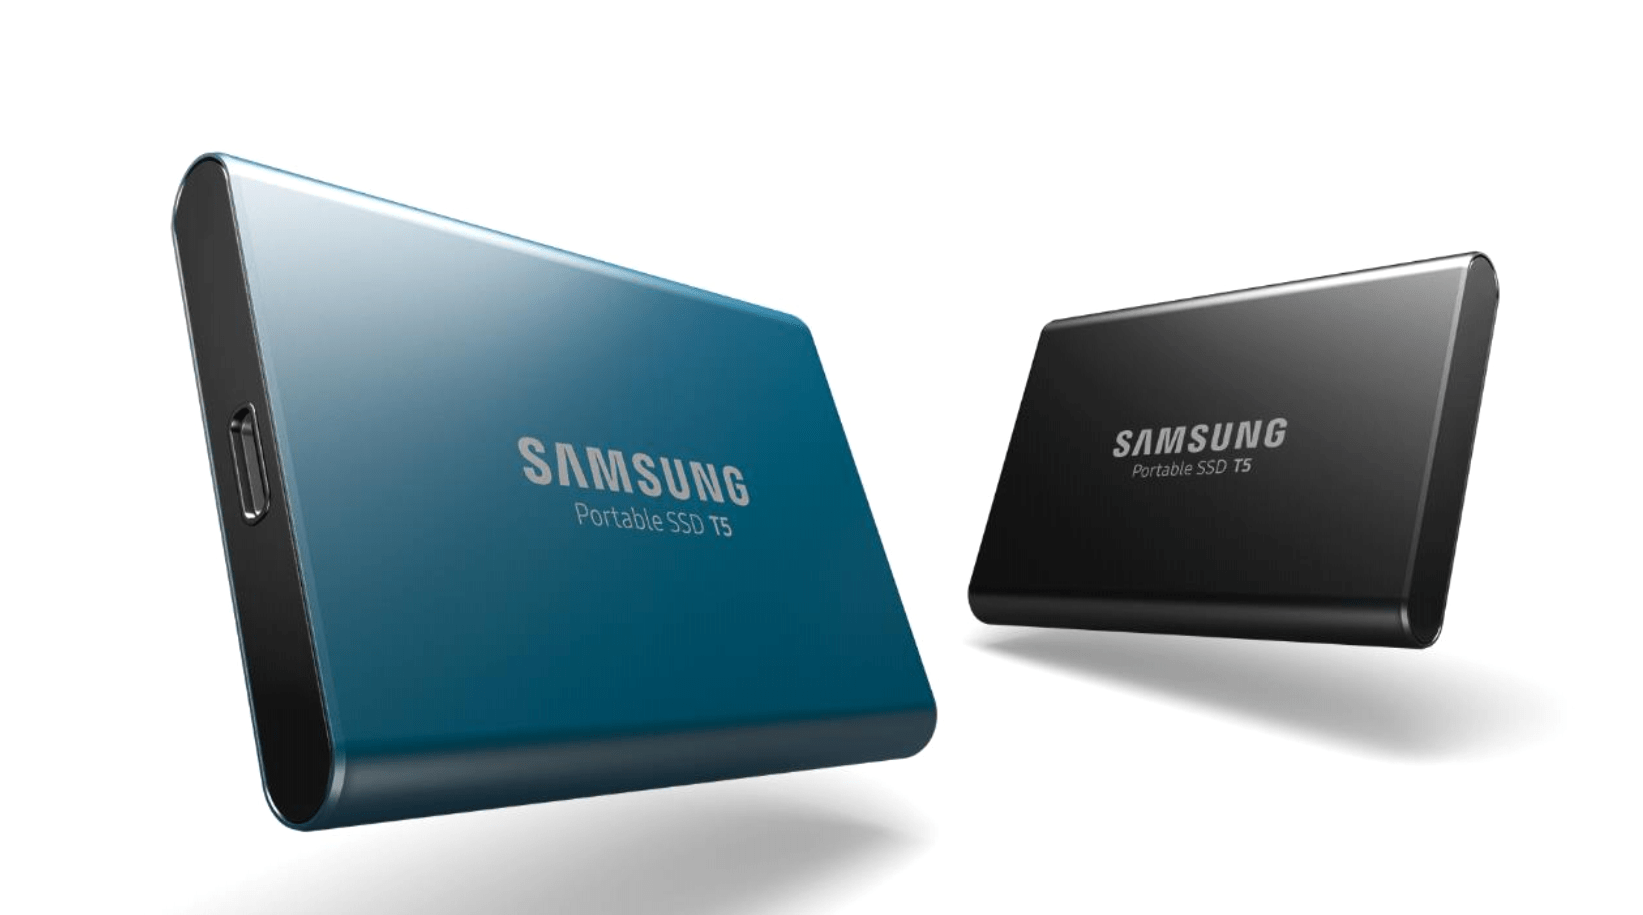 Samsung Portable T5